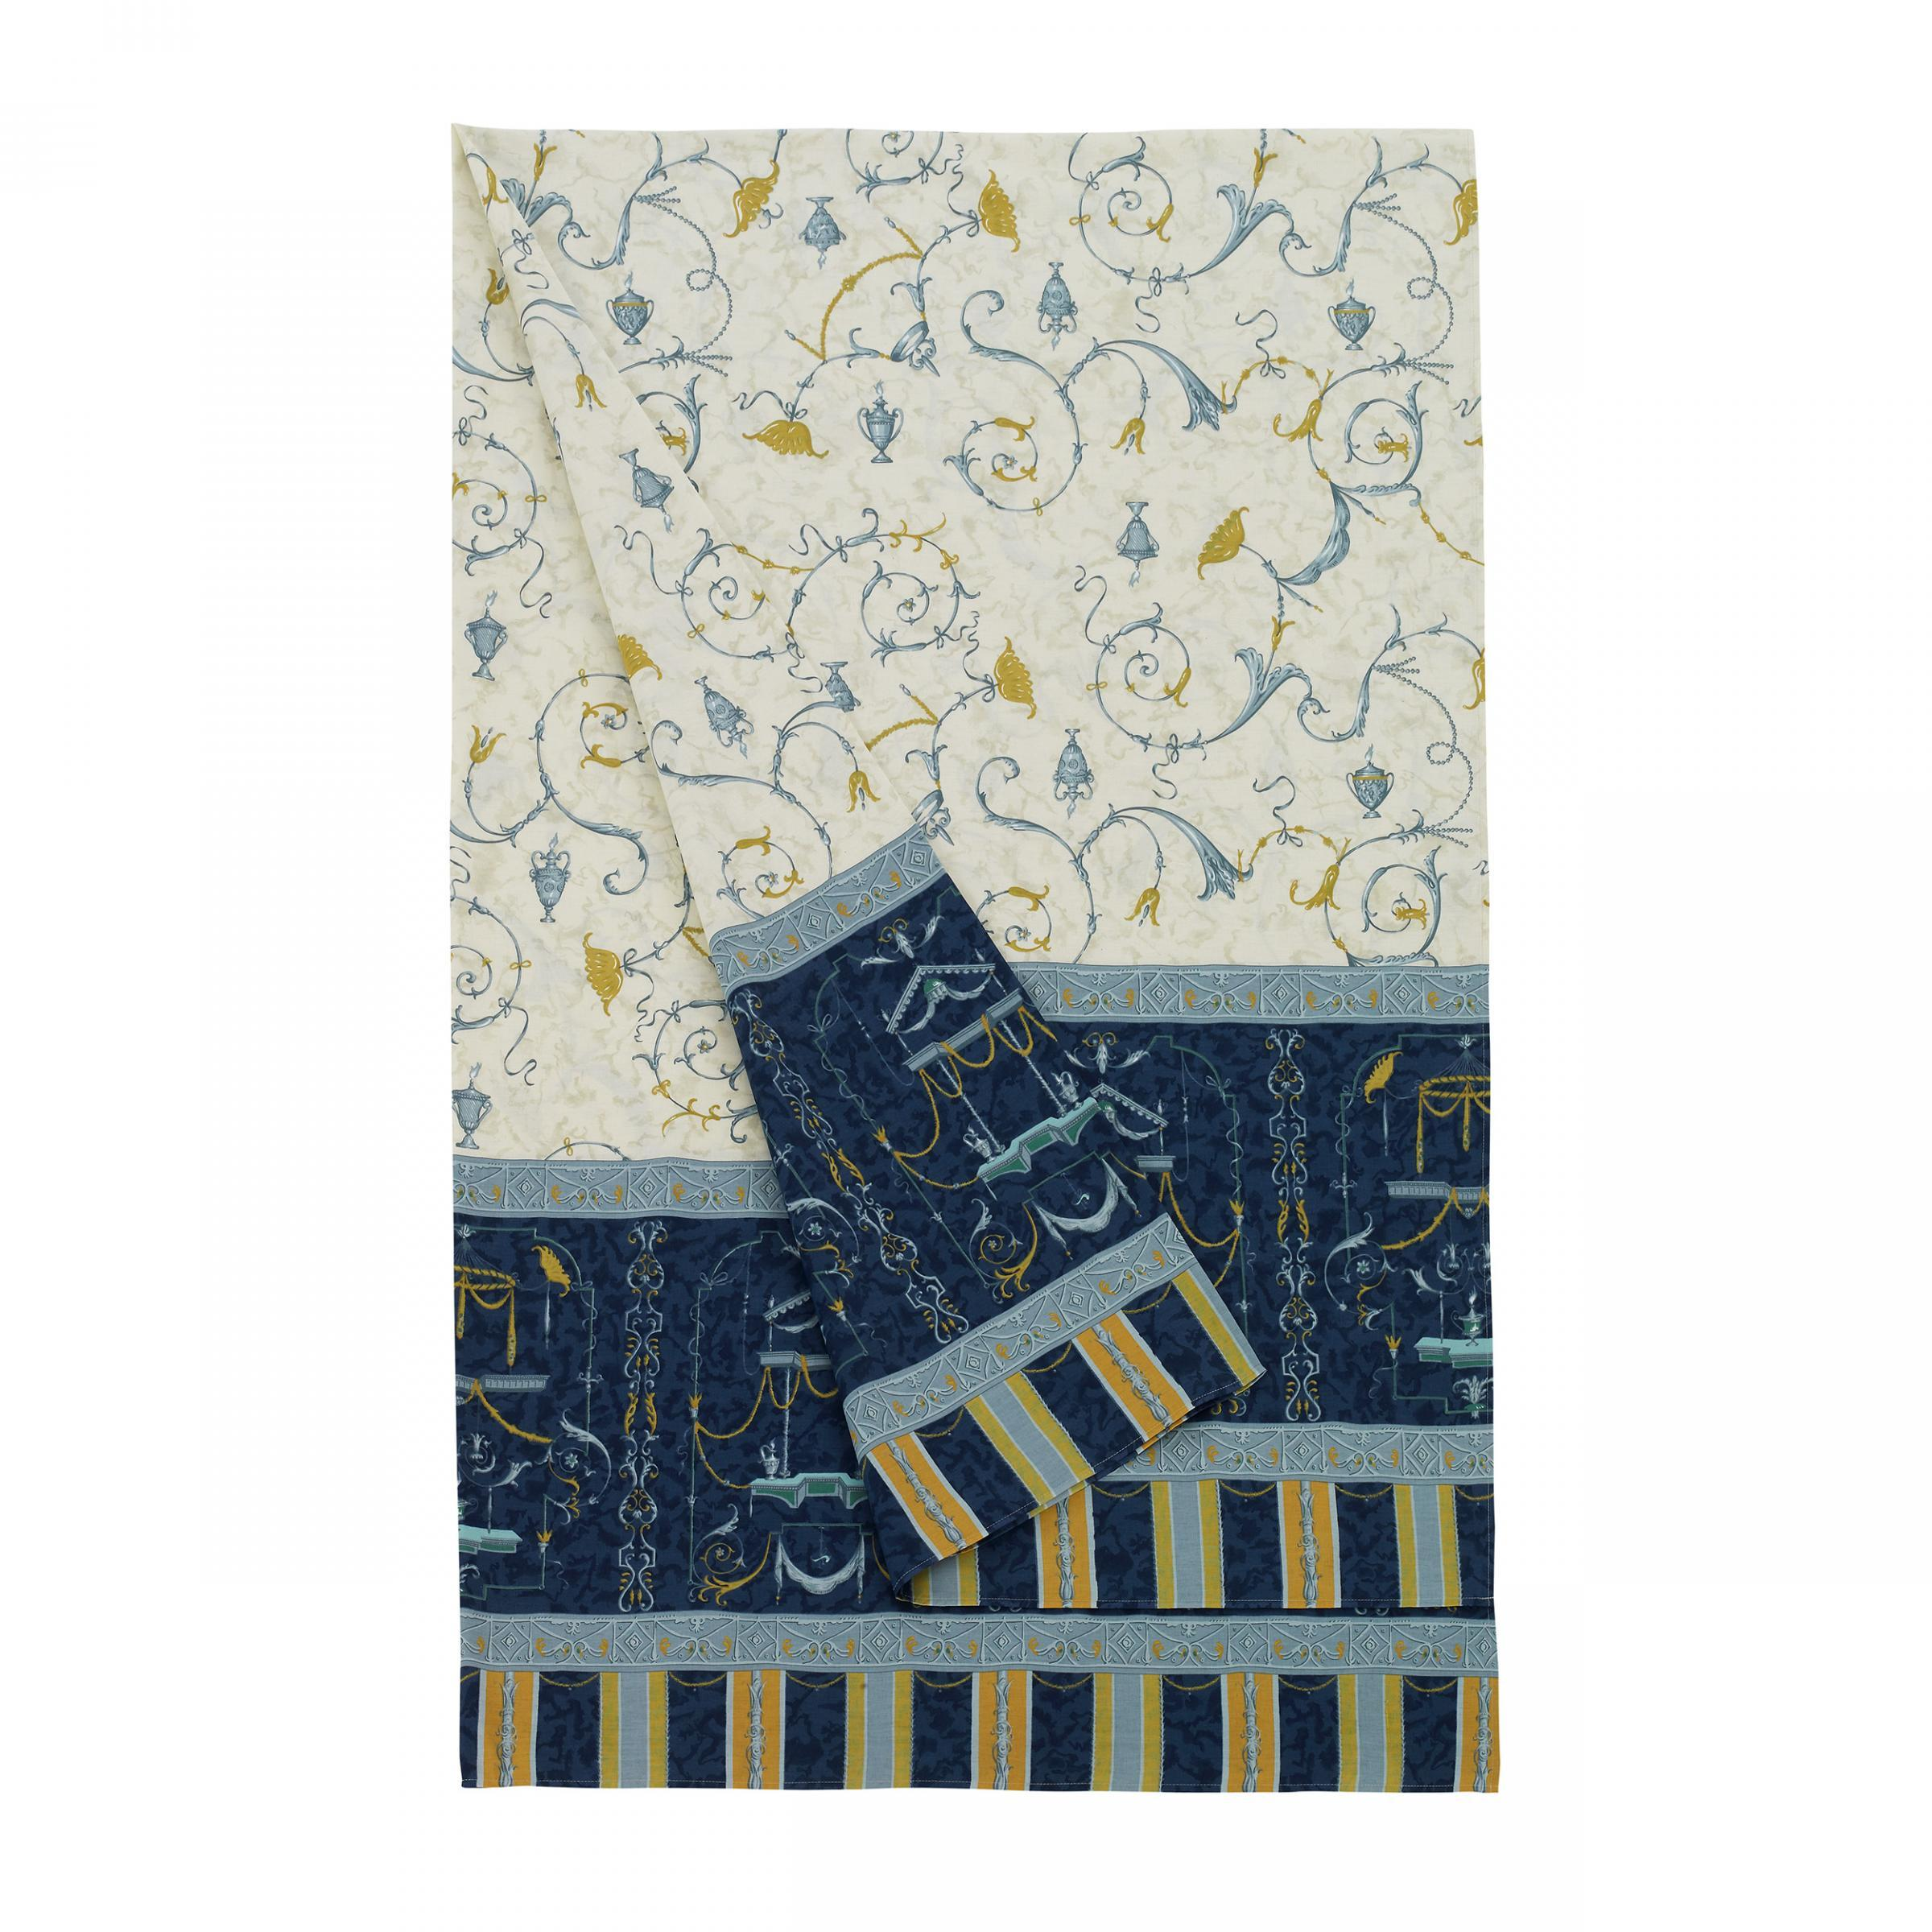 Bassetti granfoulard cloth furniture sofa oplontis 9 180 x for Bassetti telo arredo